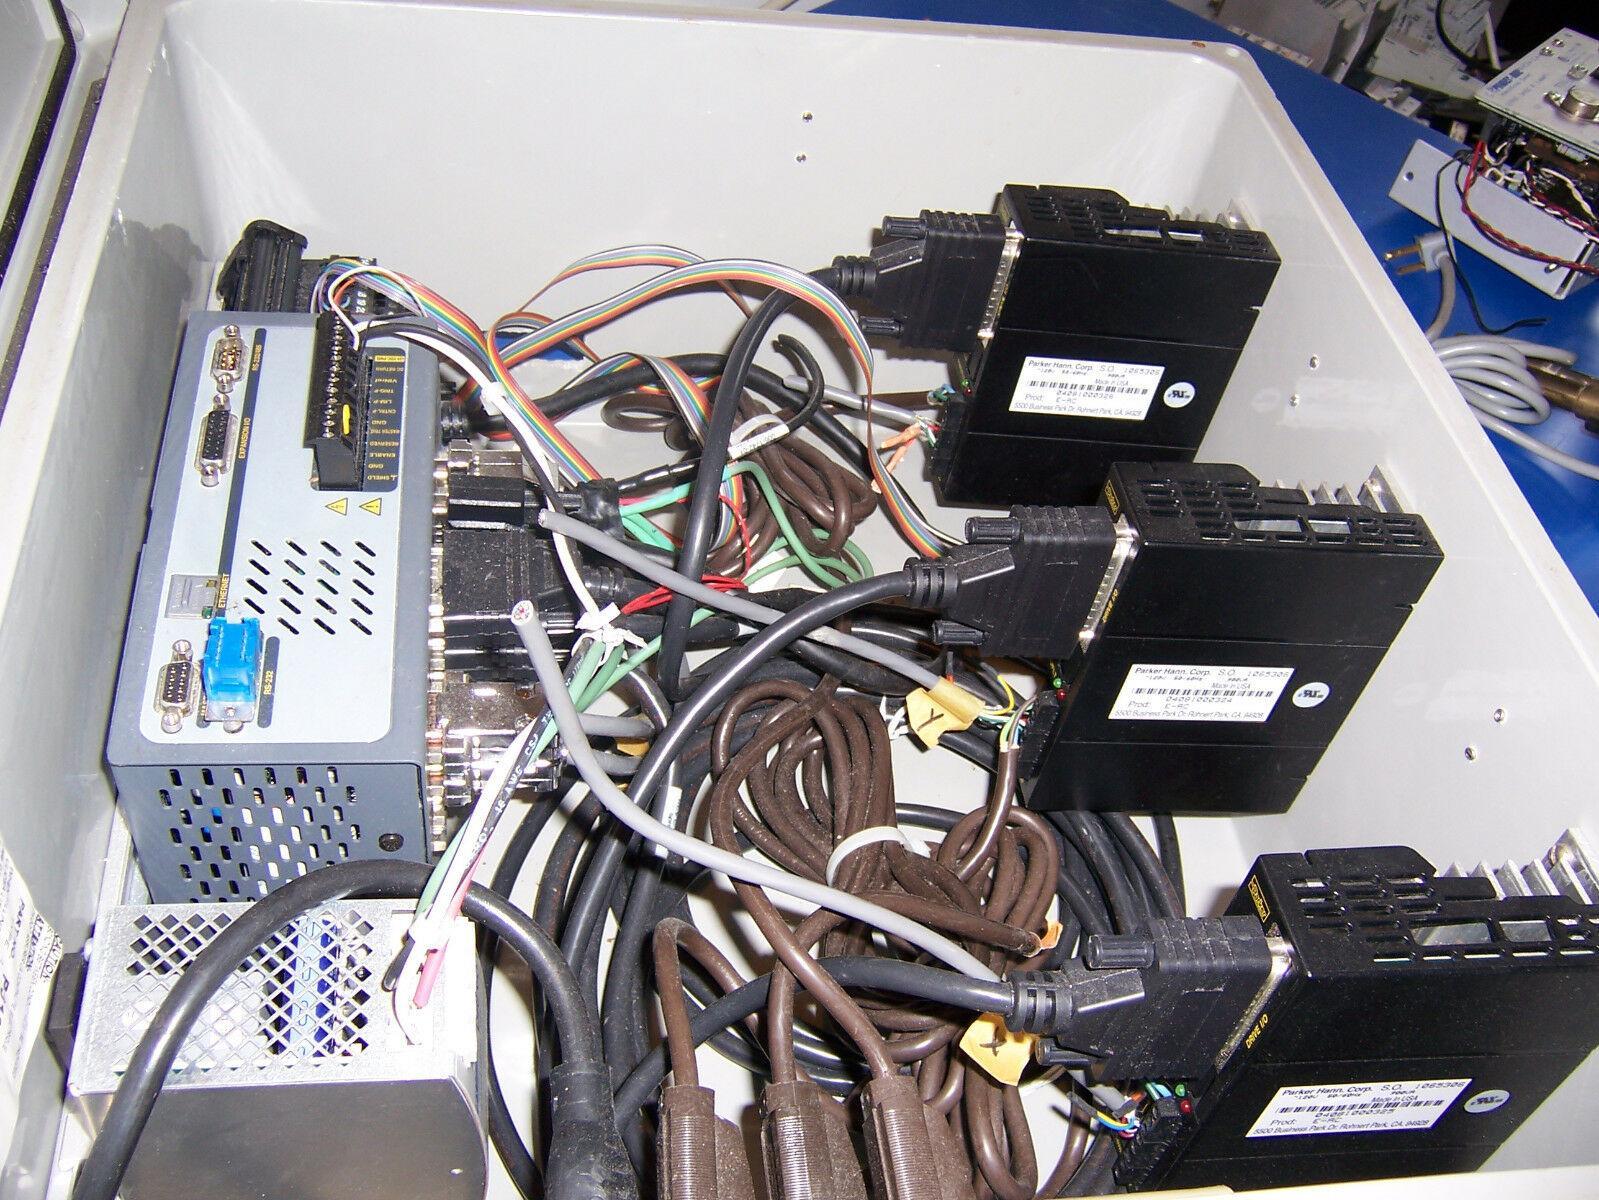 10302 PARKER 6K4 SERVO / STEPPER 4-AXIS CONTROLLER W/ E SERIES DRIVER BOARDS